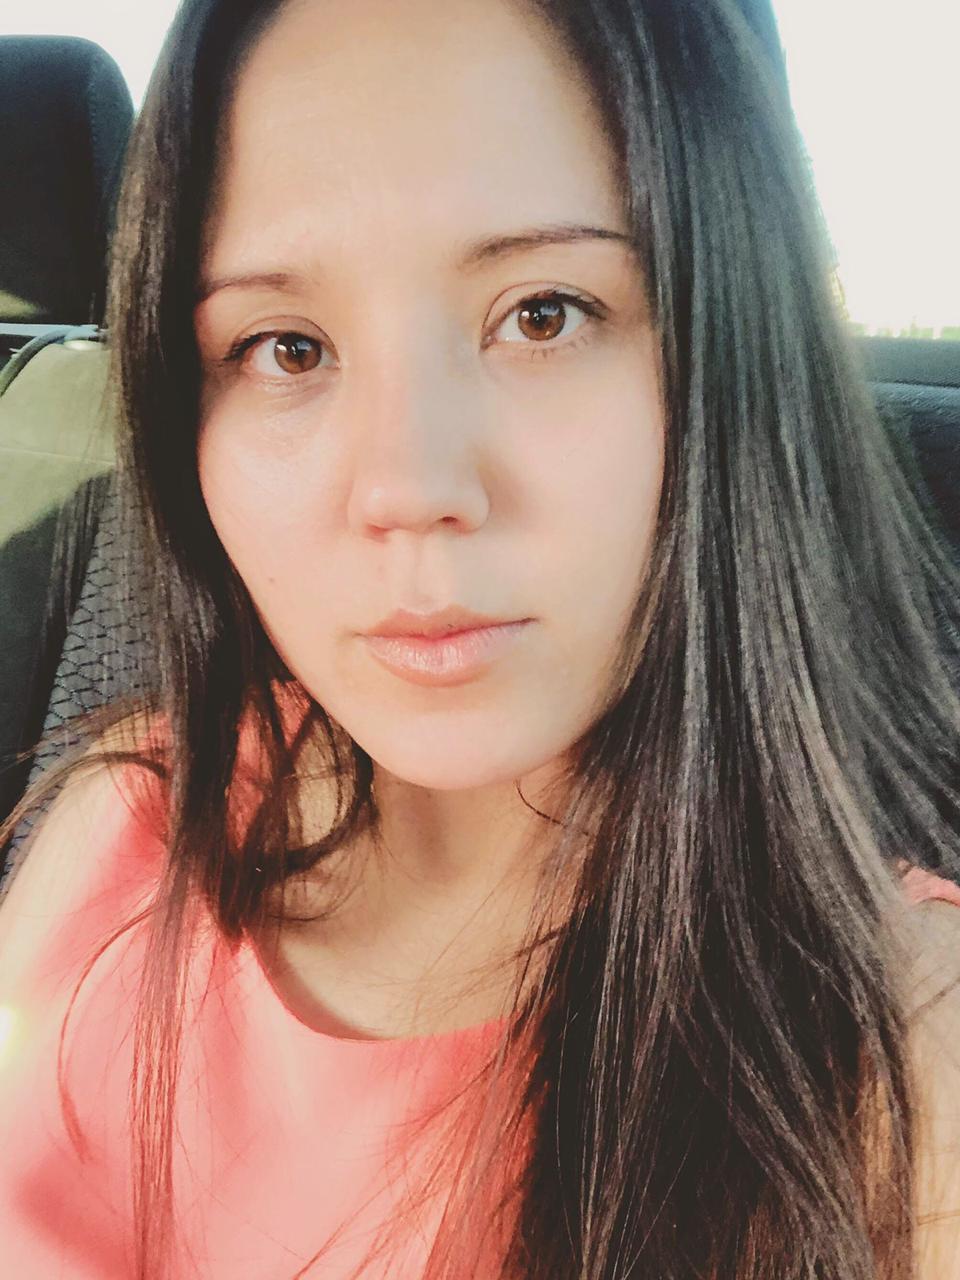 https://aiadubai.com/wp-content/uploads/2019/12/Nafisa-Galeeva.jpeg